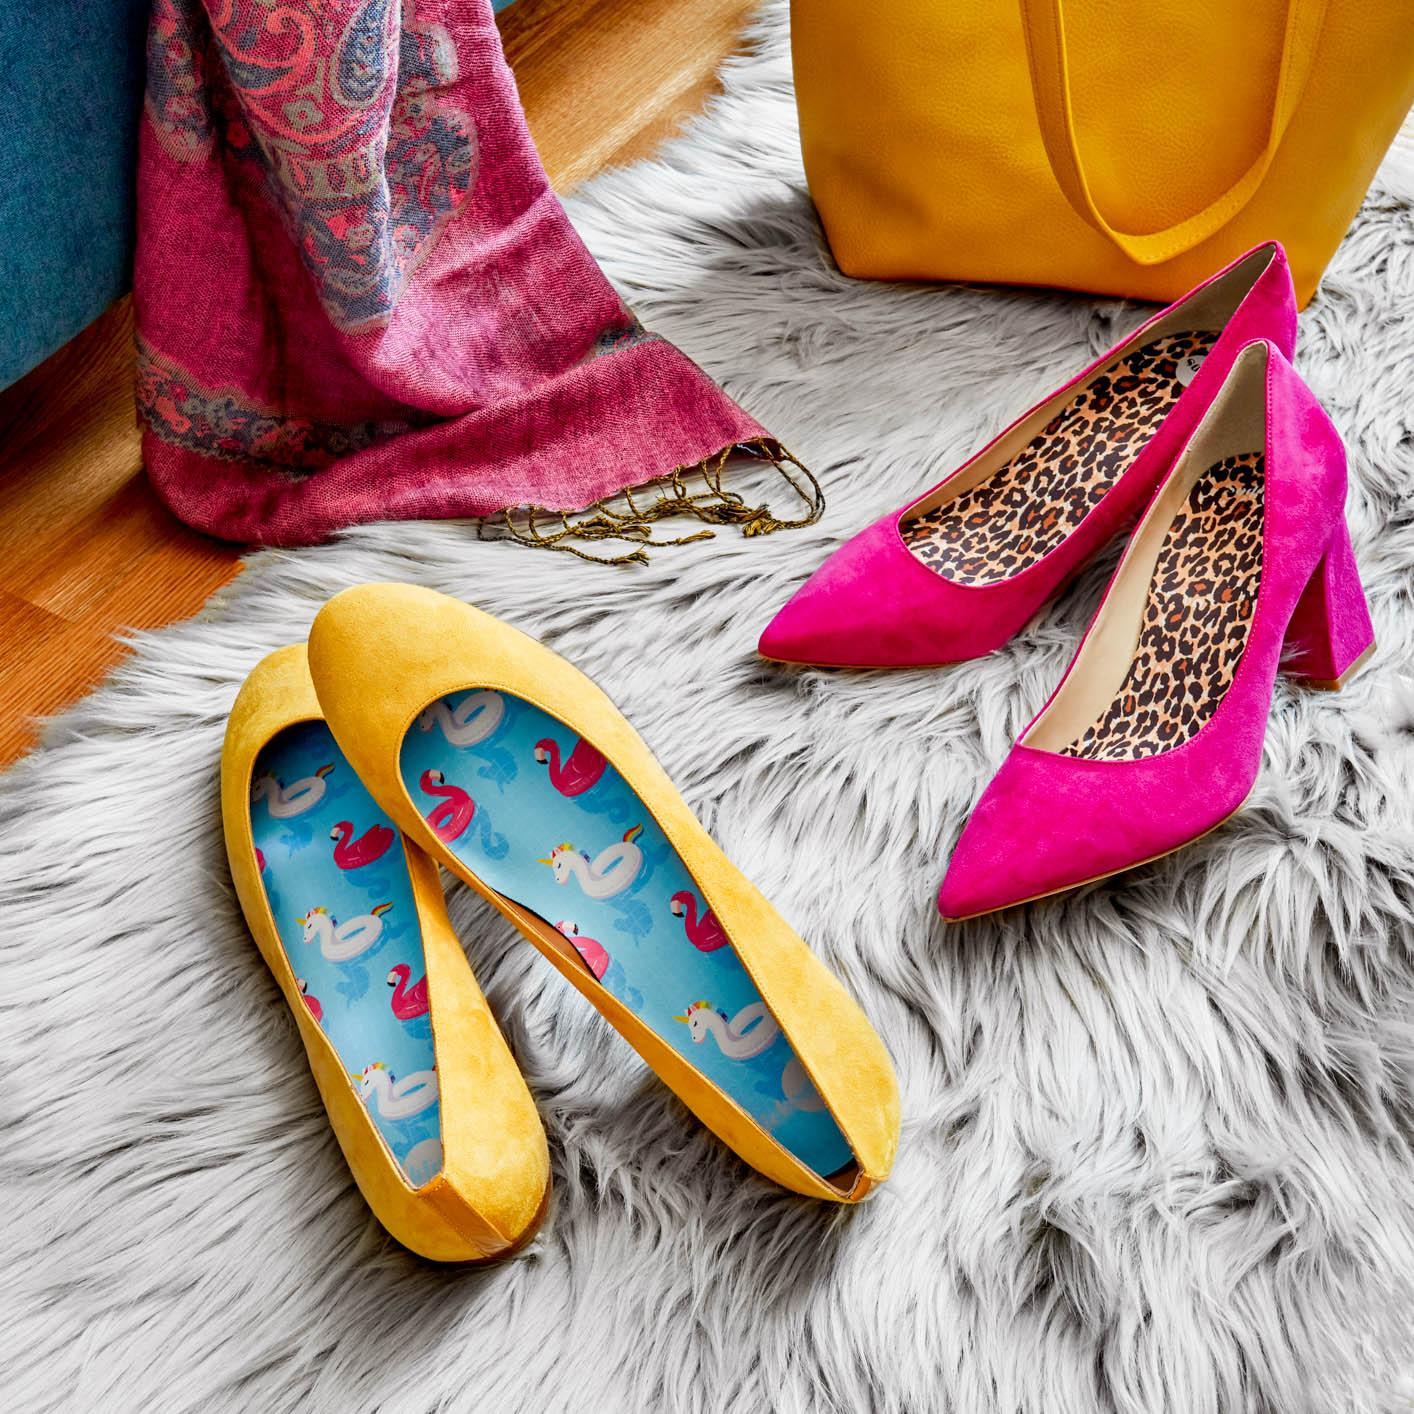 kickspos-brand-photography-shoes-insoles-8.jpg